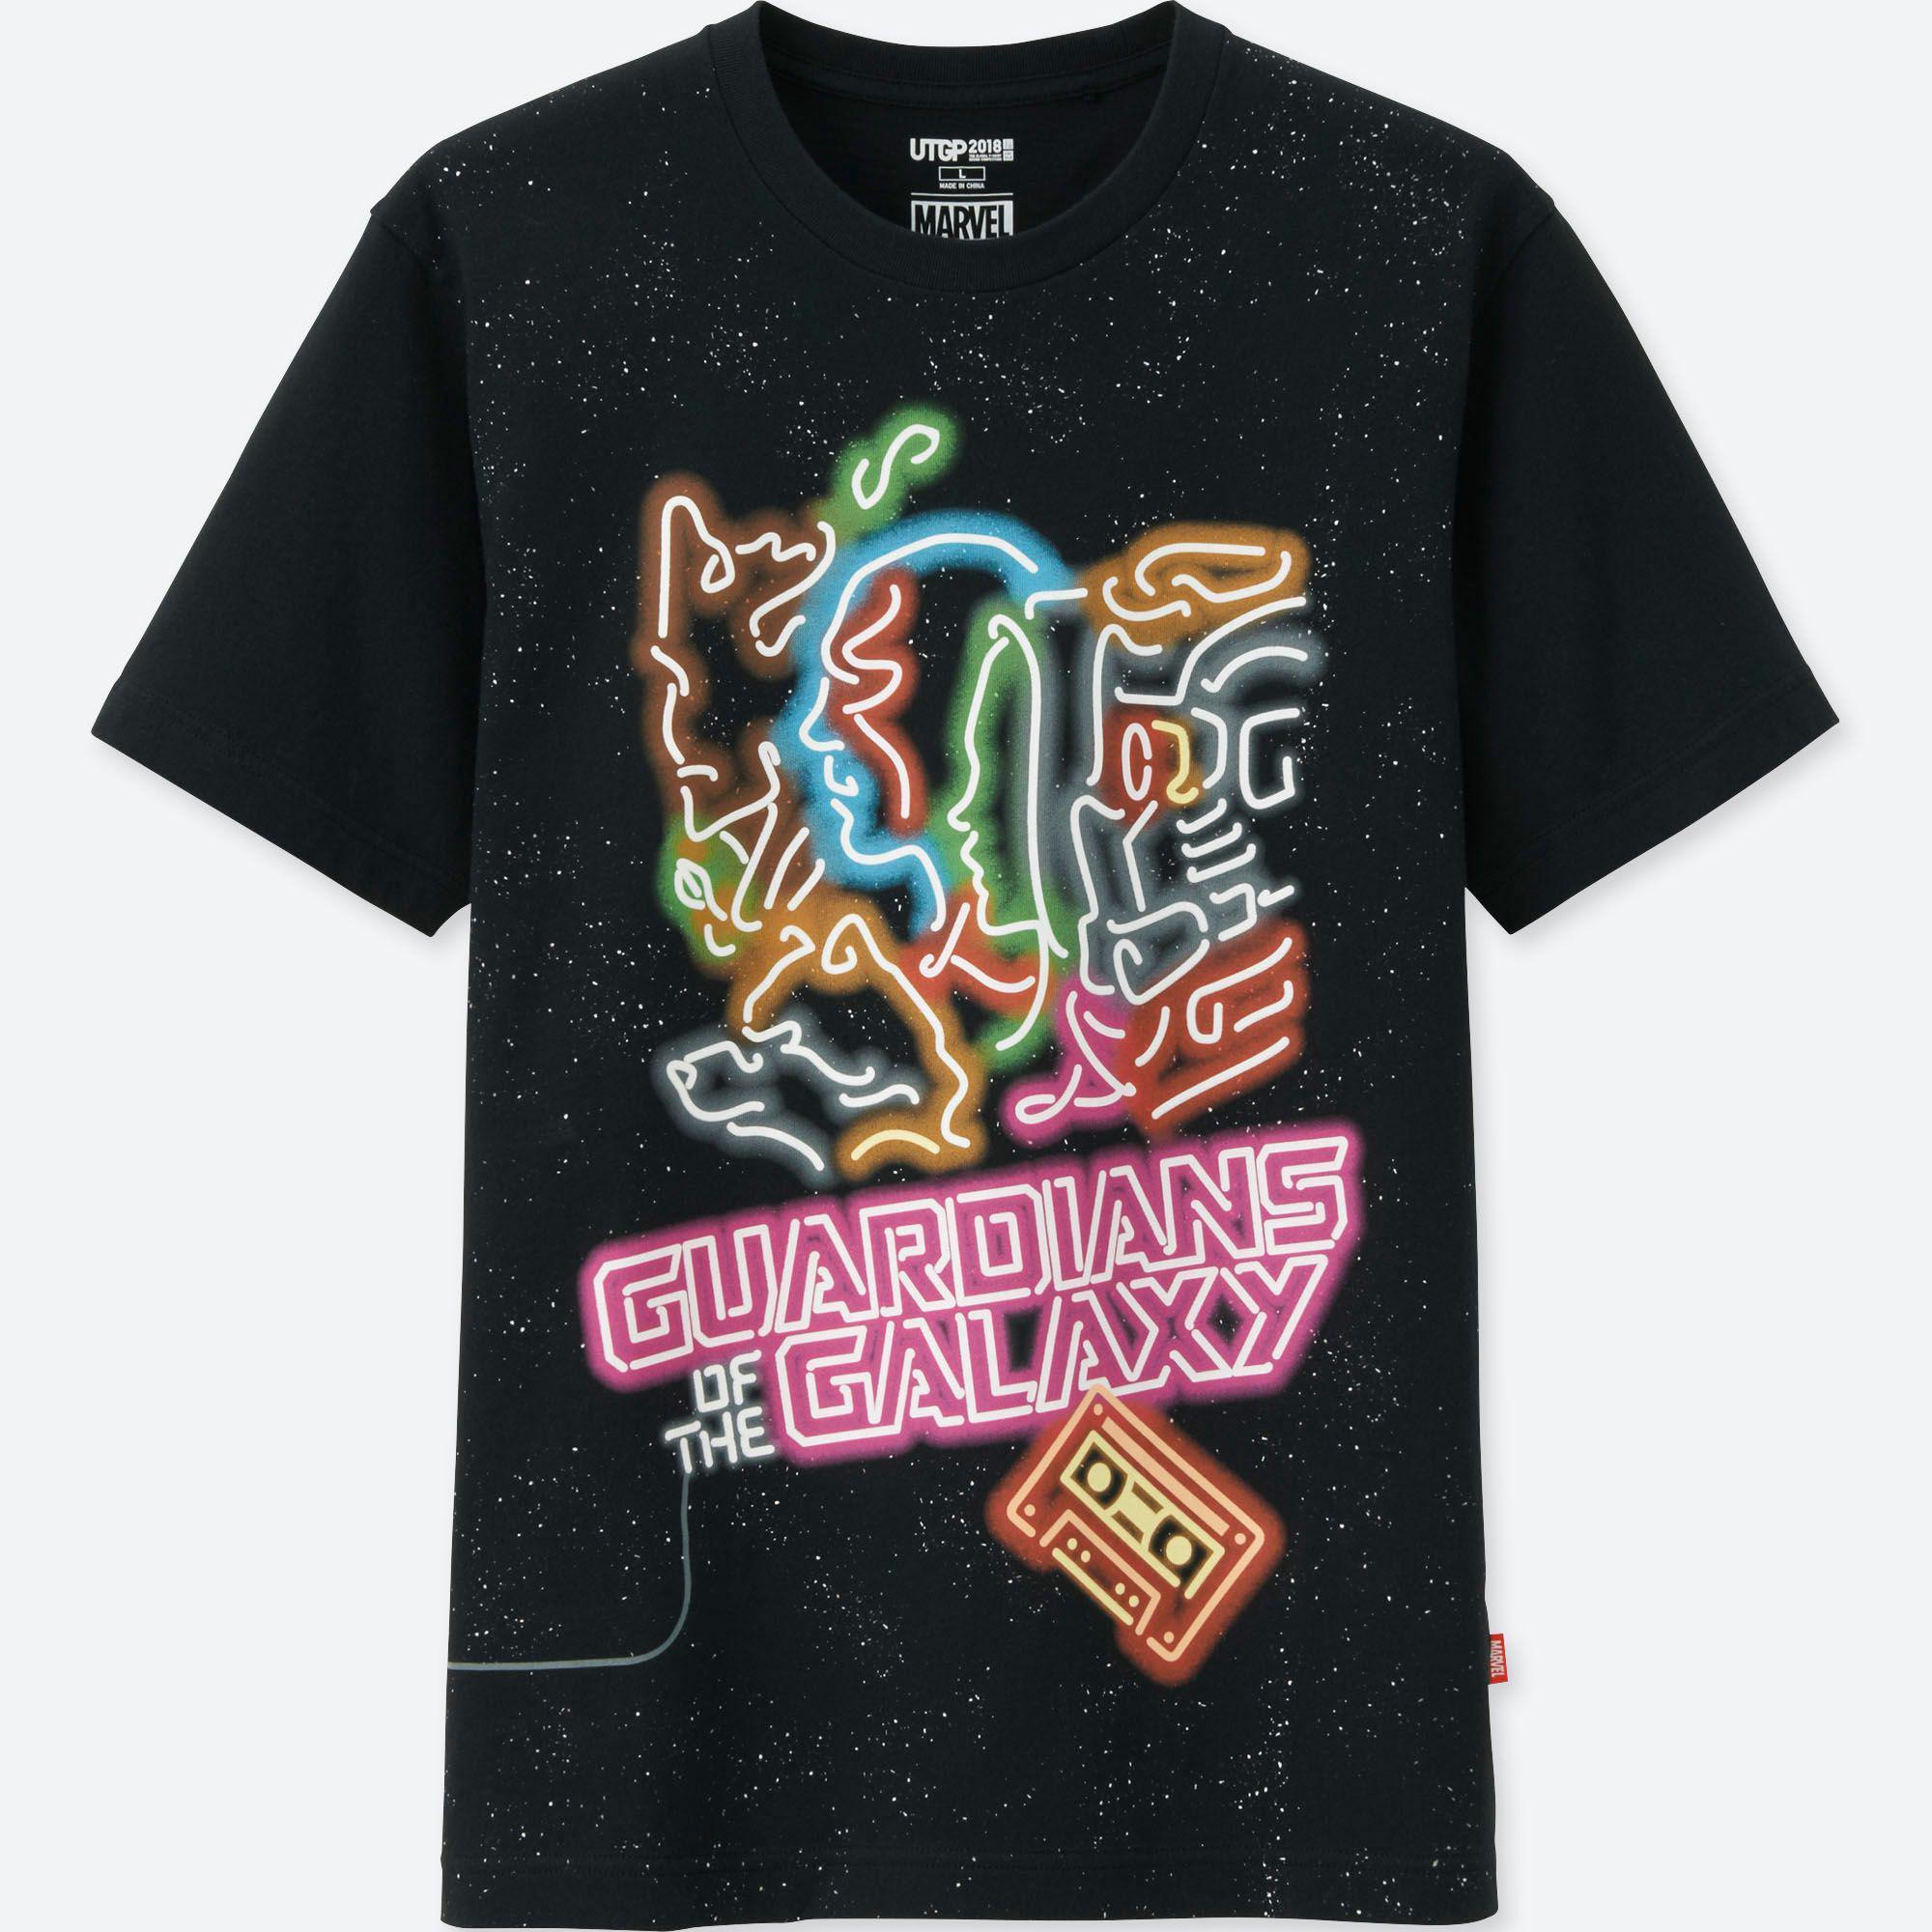 48040027 Uniqlo. Men's Black Ut Grand Prix Marvel Short Sleeve Graphic T-shirt